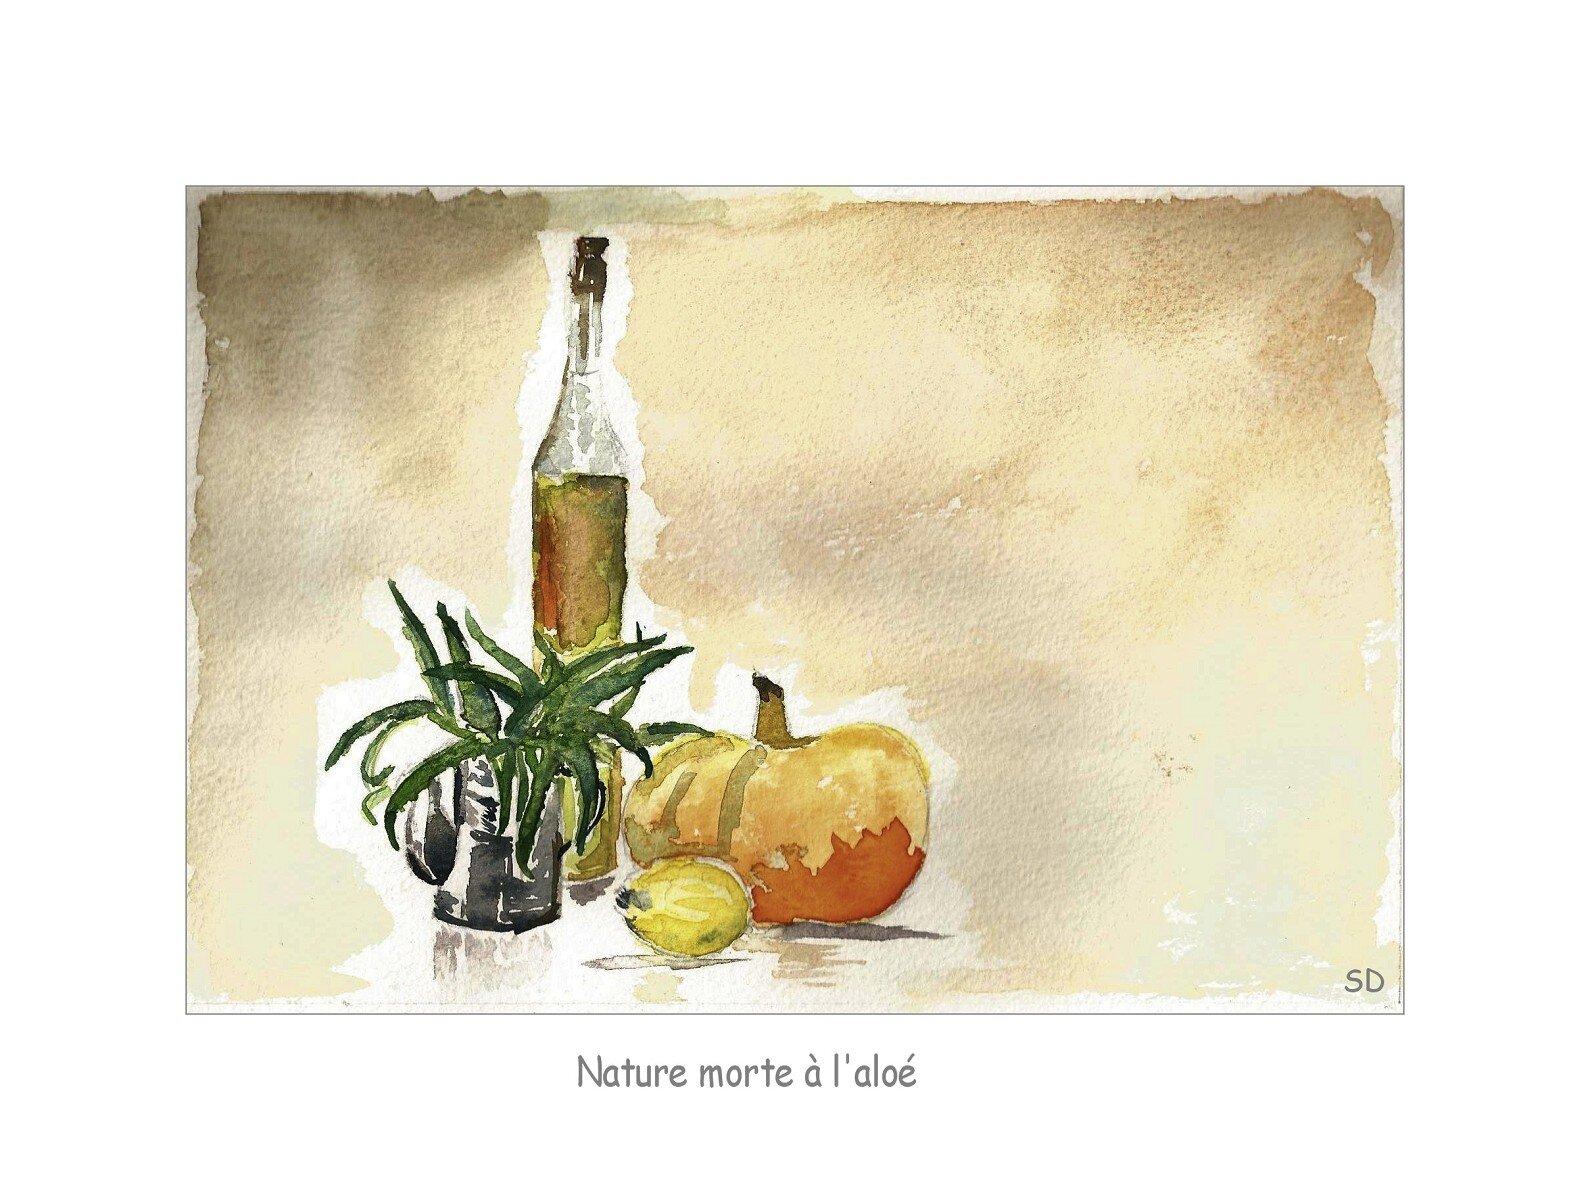 nature morte à l'Aloe